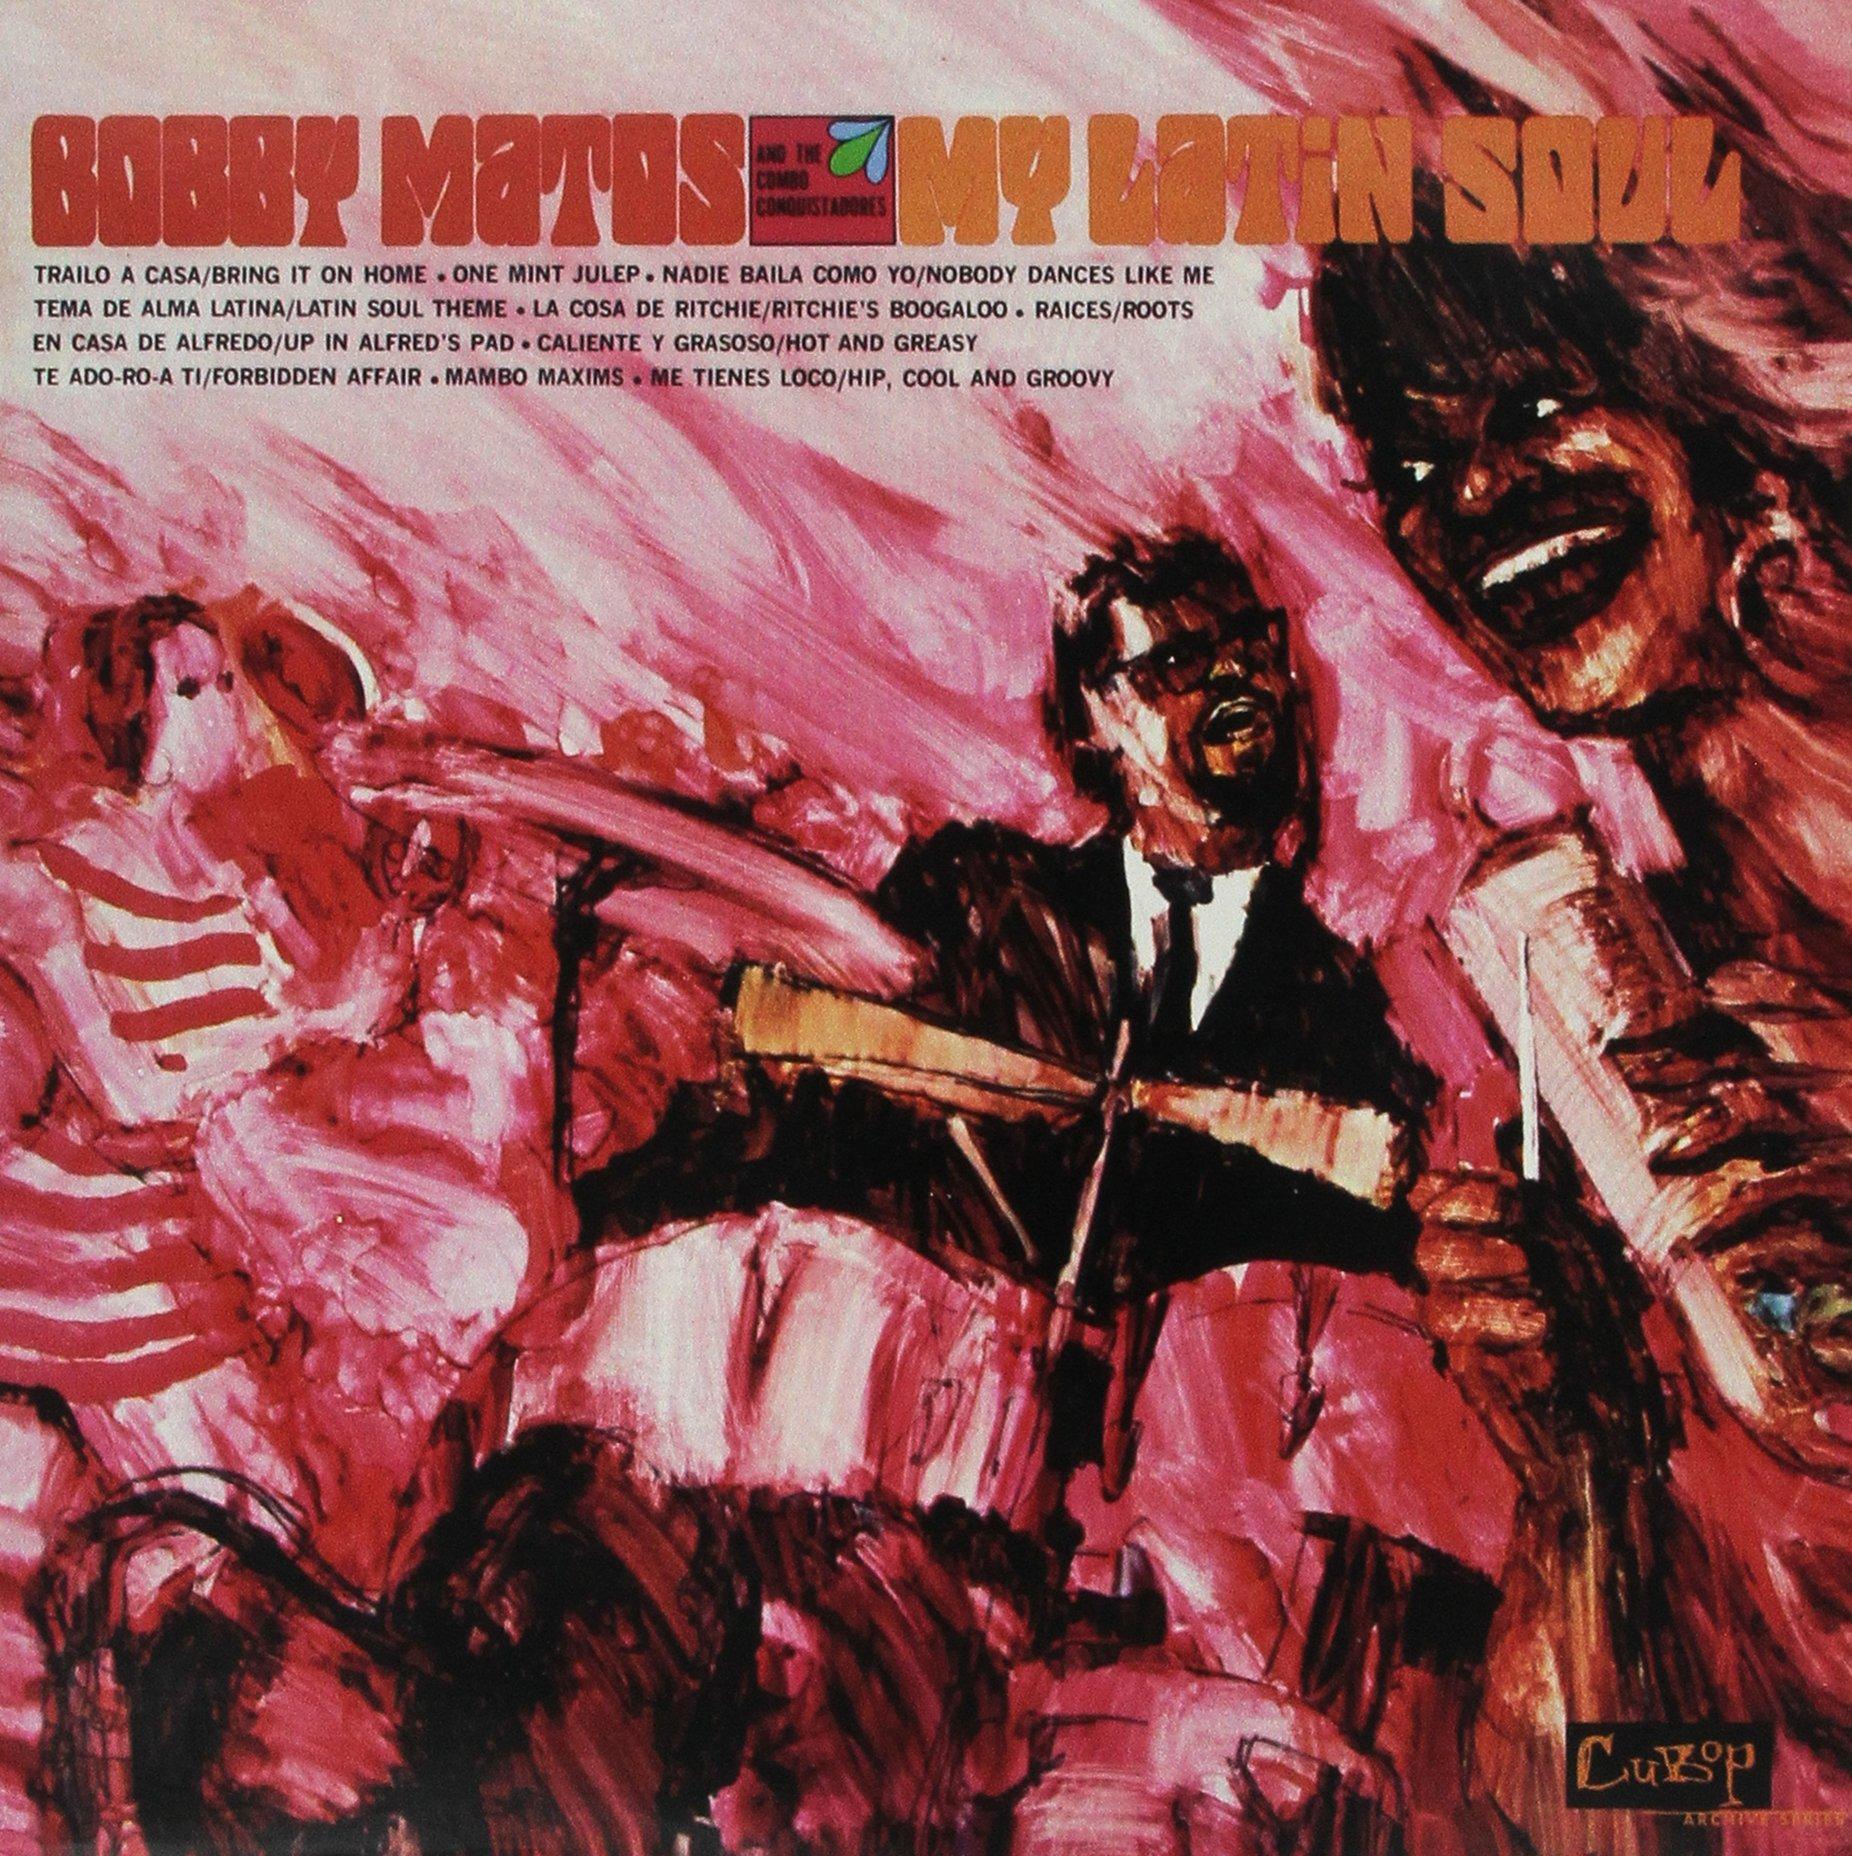 My Latin Soul [Vinyl] by Imports